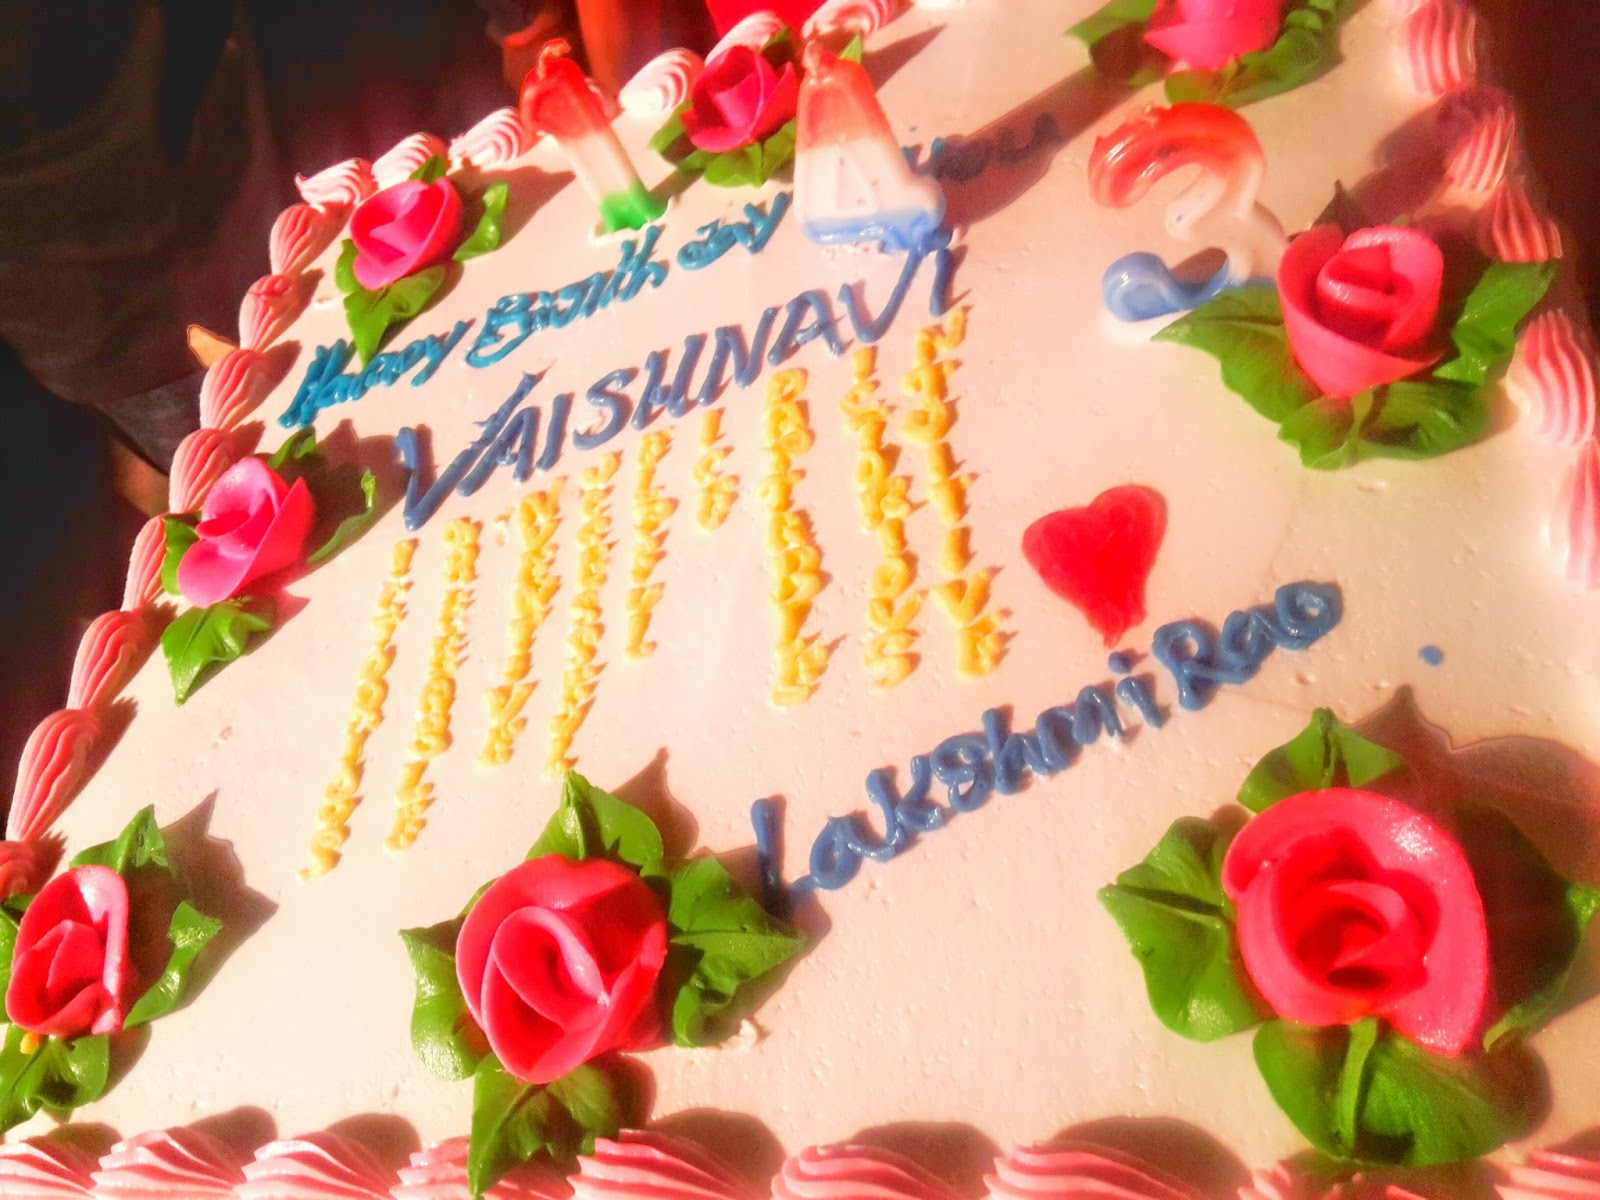 Vaishu 14th Birthday Pics At Kakinada 31 12 2015 Vaishnavi Pics